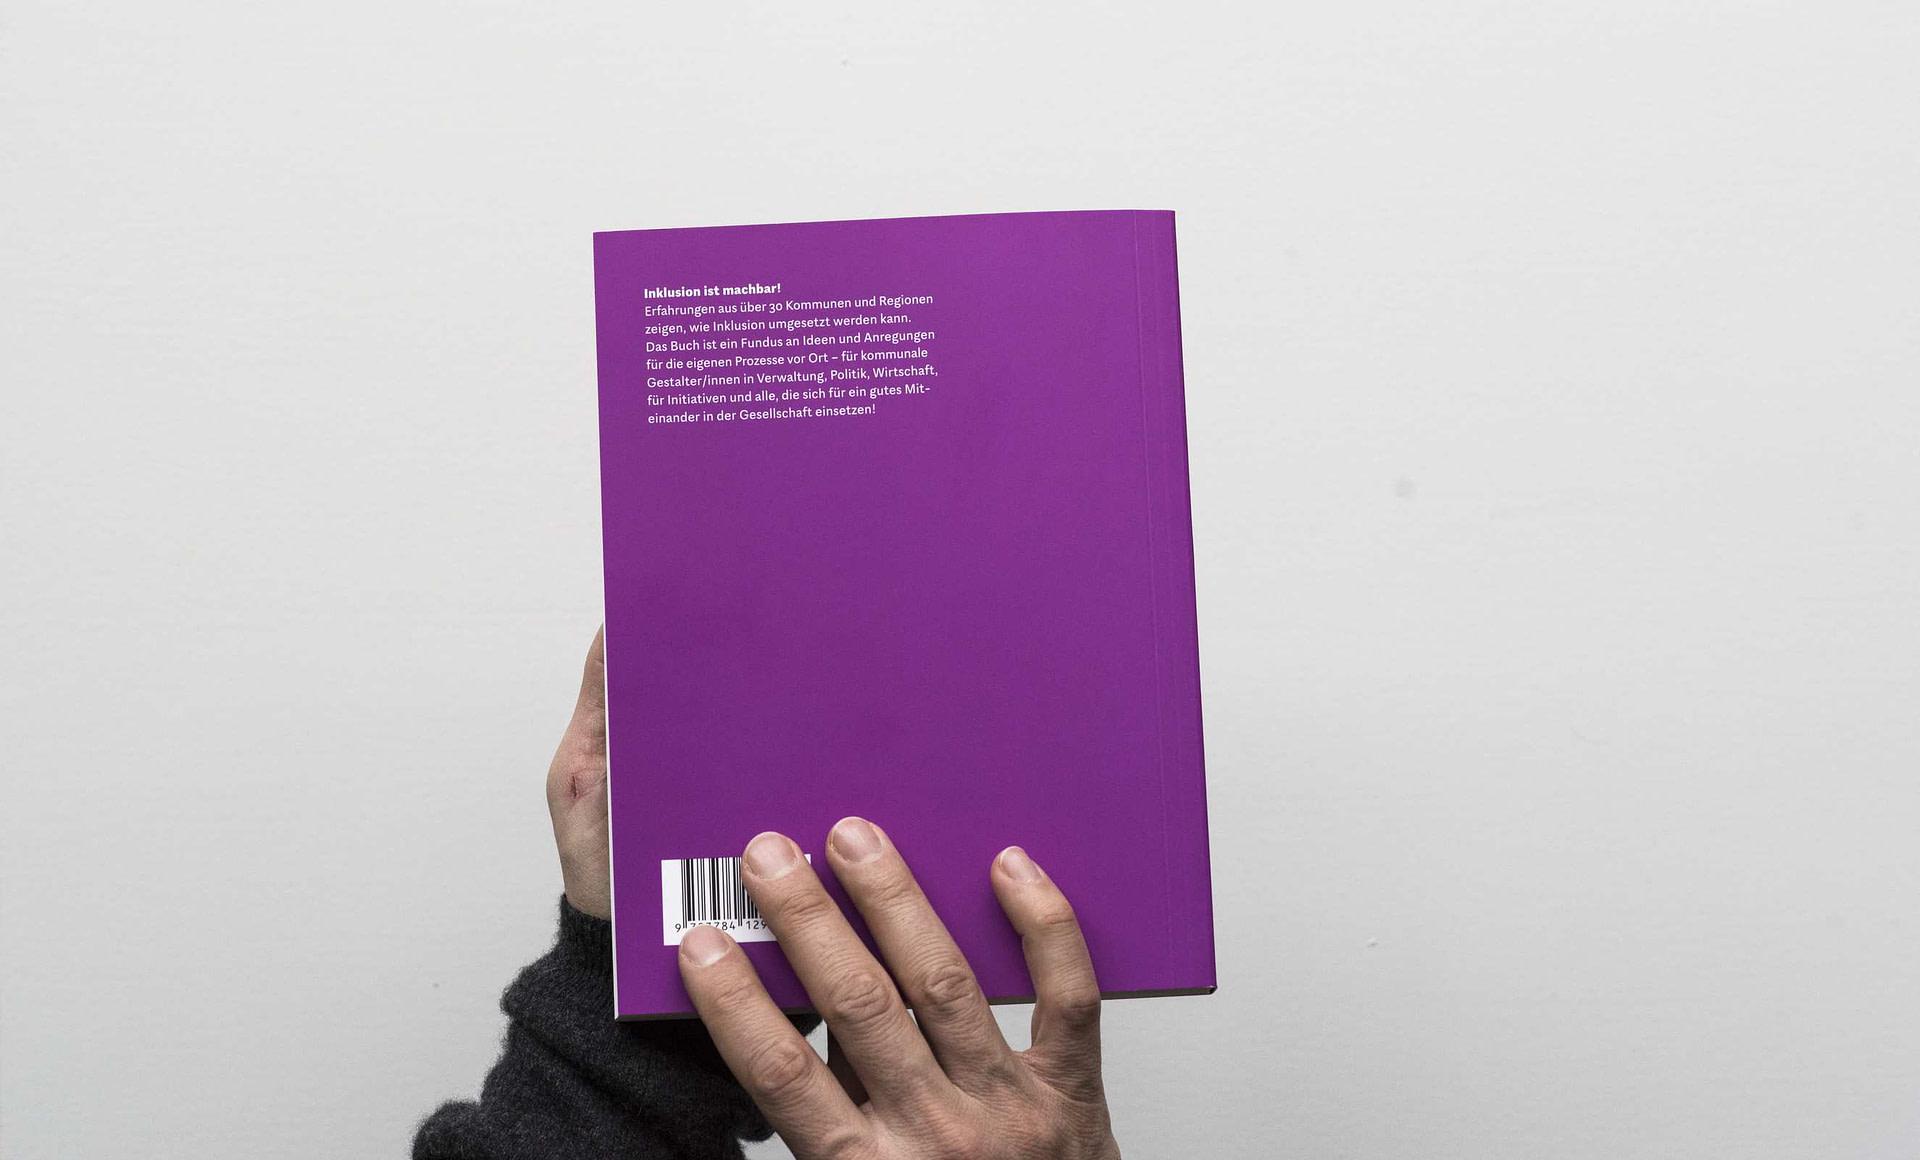 inclusion-fieldbook-27-2650x1600px